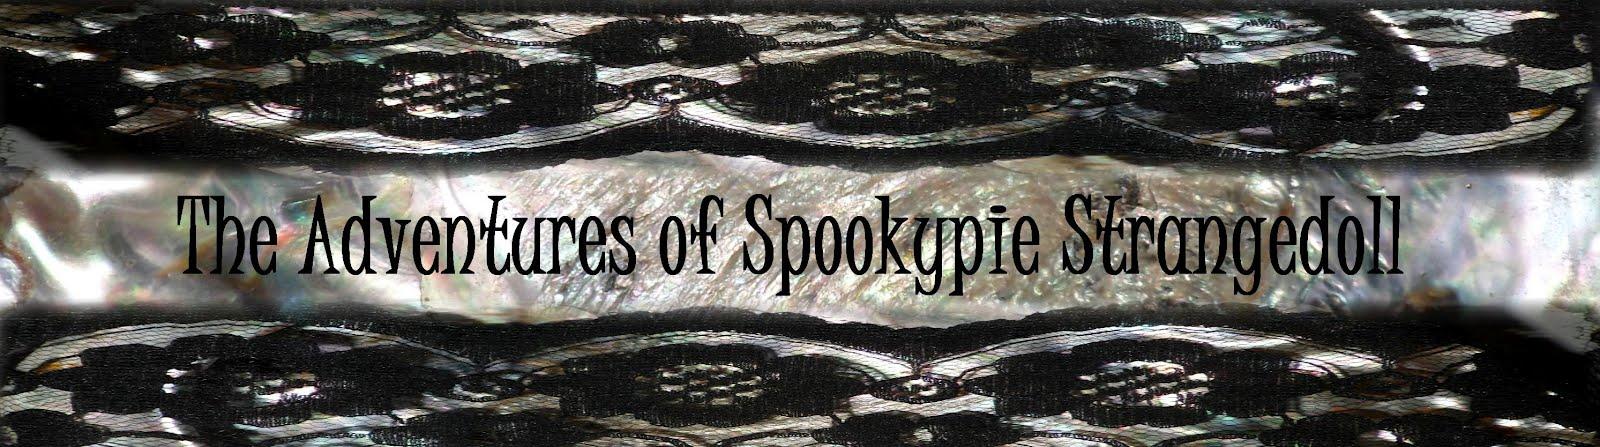 The Adventures of Spookypie Strangedoll